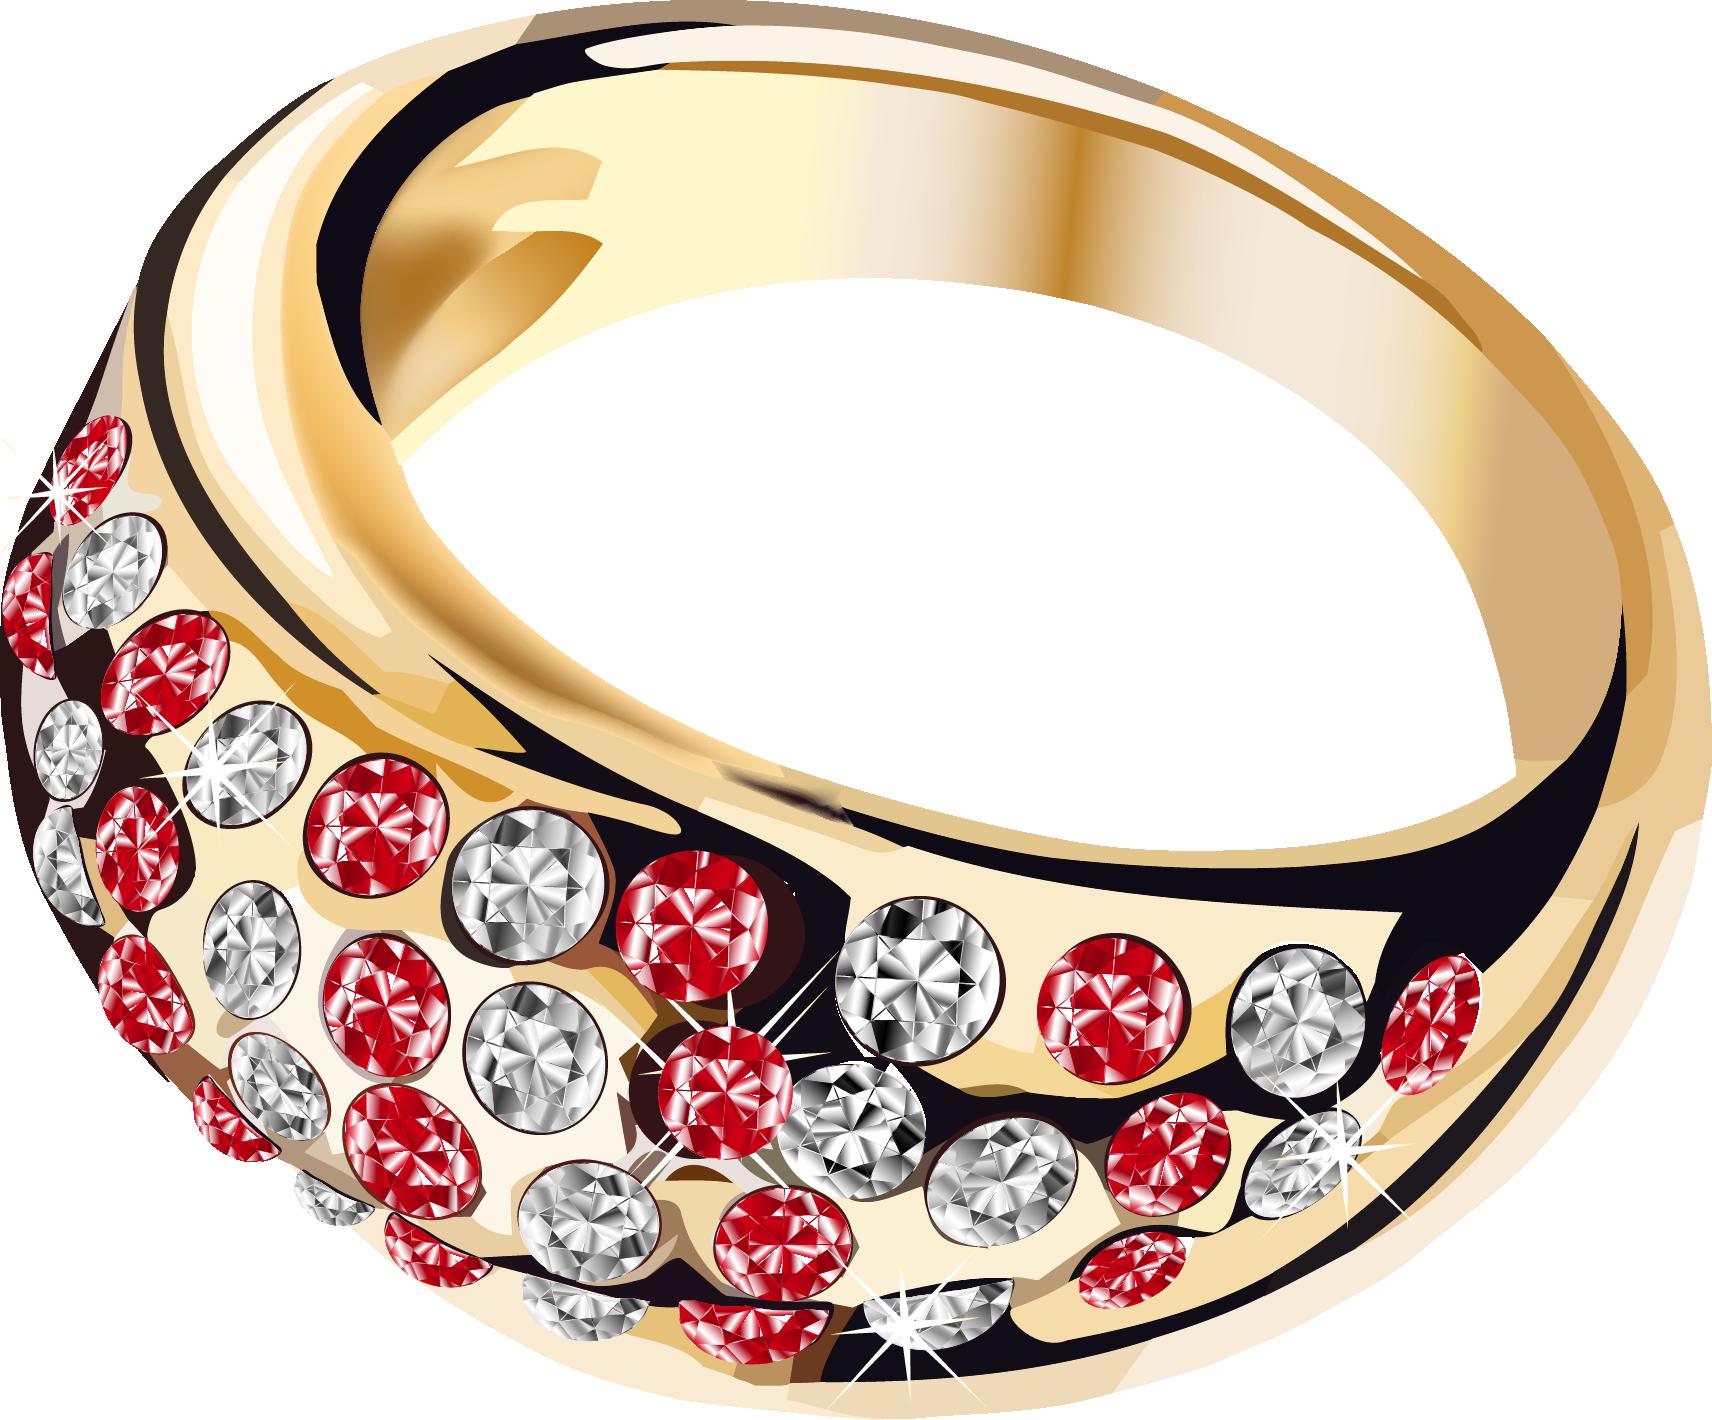 Imitation Jewellery PNG - 69520